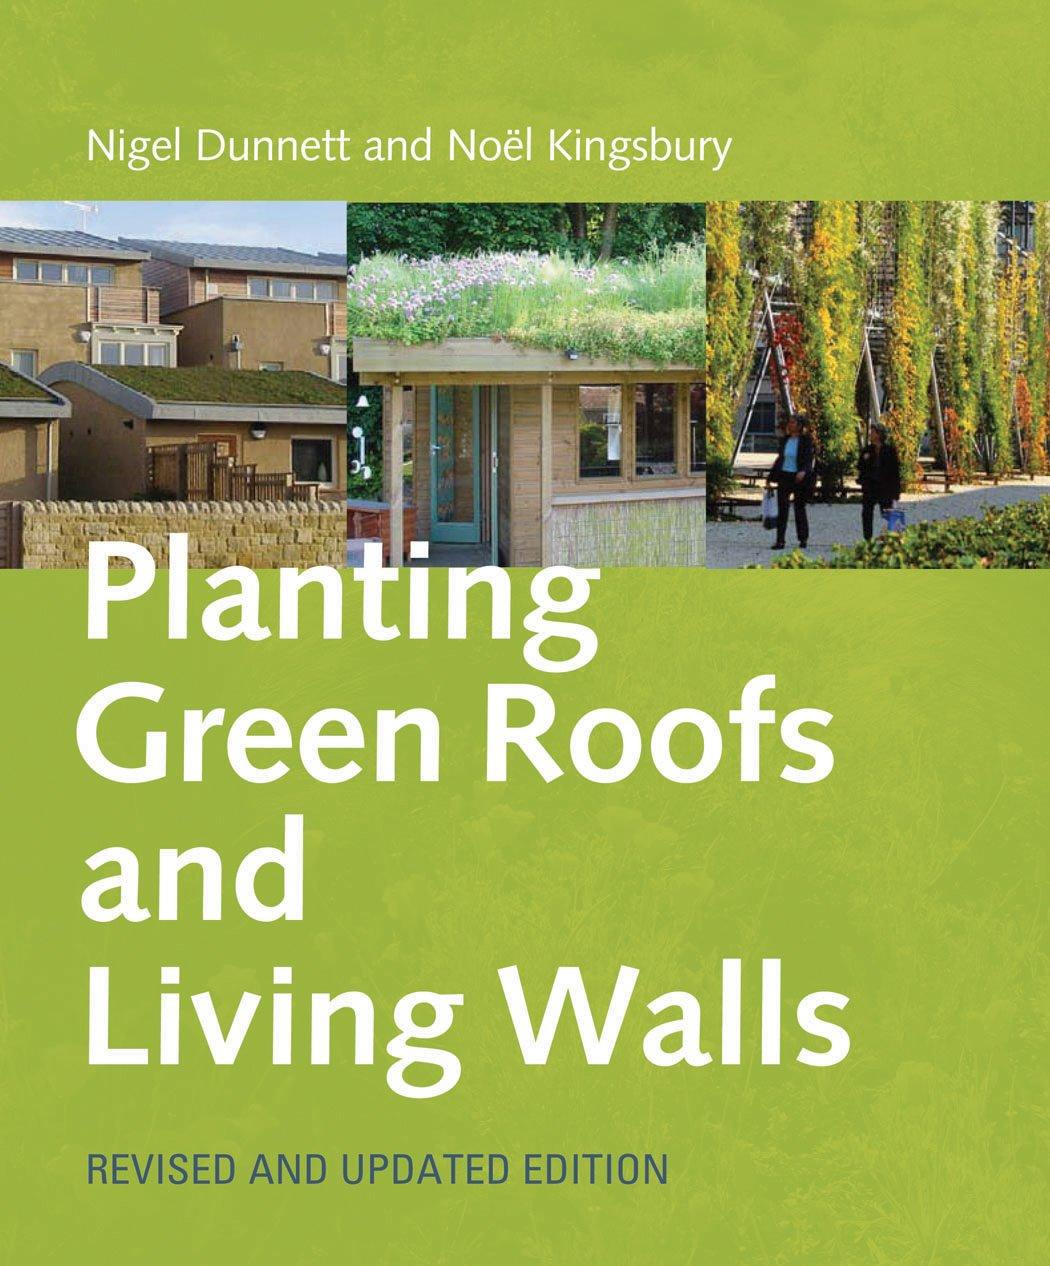 amazon planting green roofs and living walls nigel dunnett noel